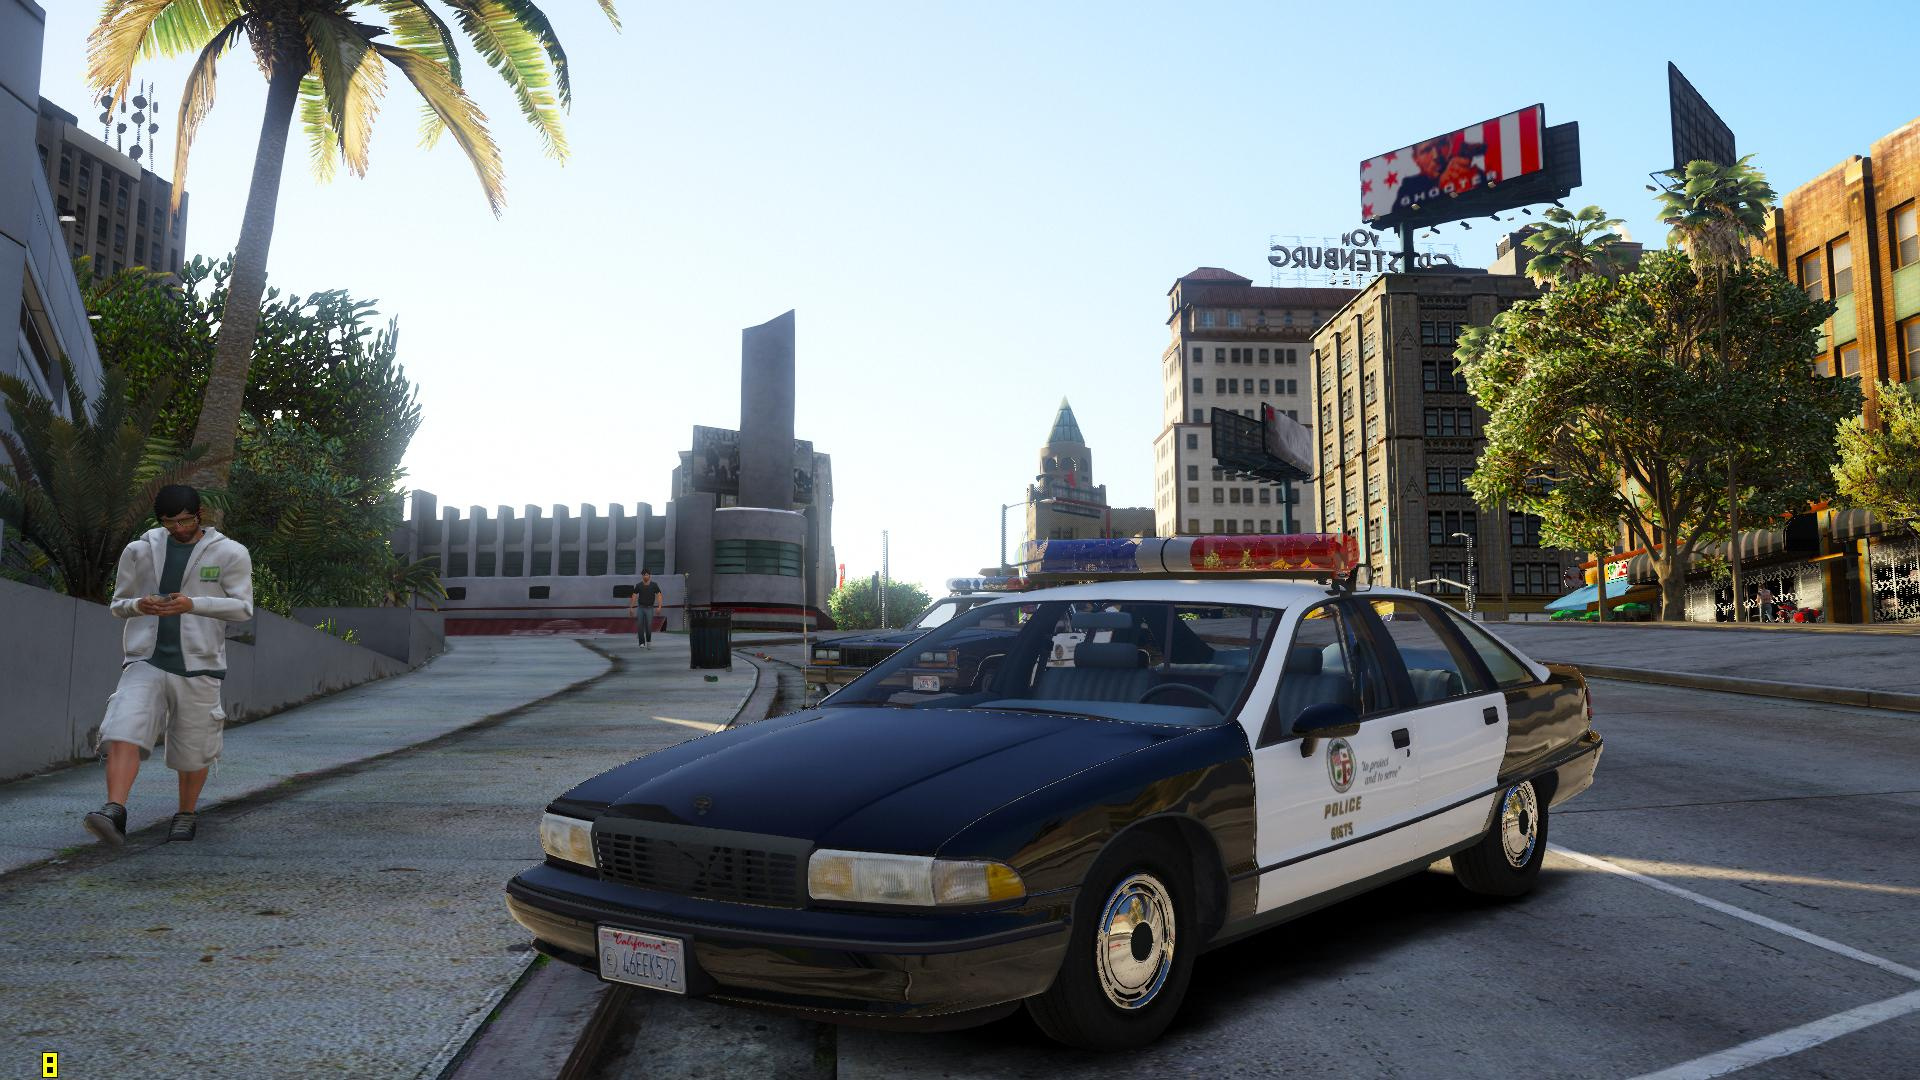 Els 1991 Chevrolet Caprice 9c1 Los Angeles Police